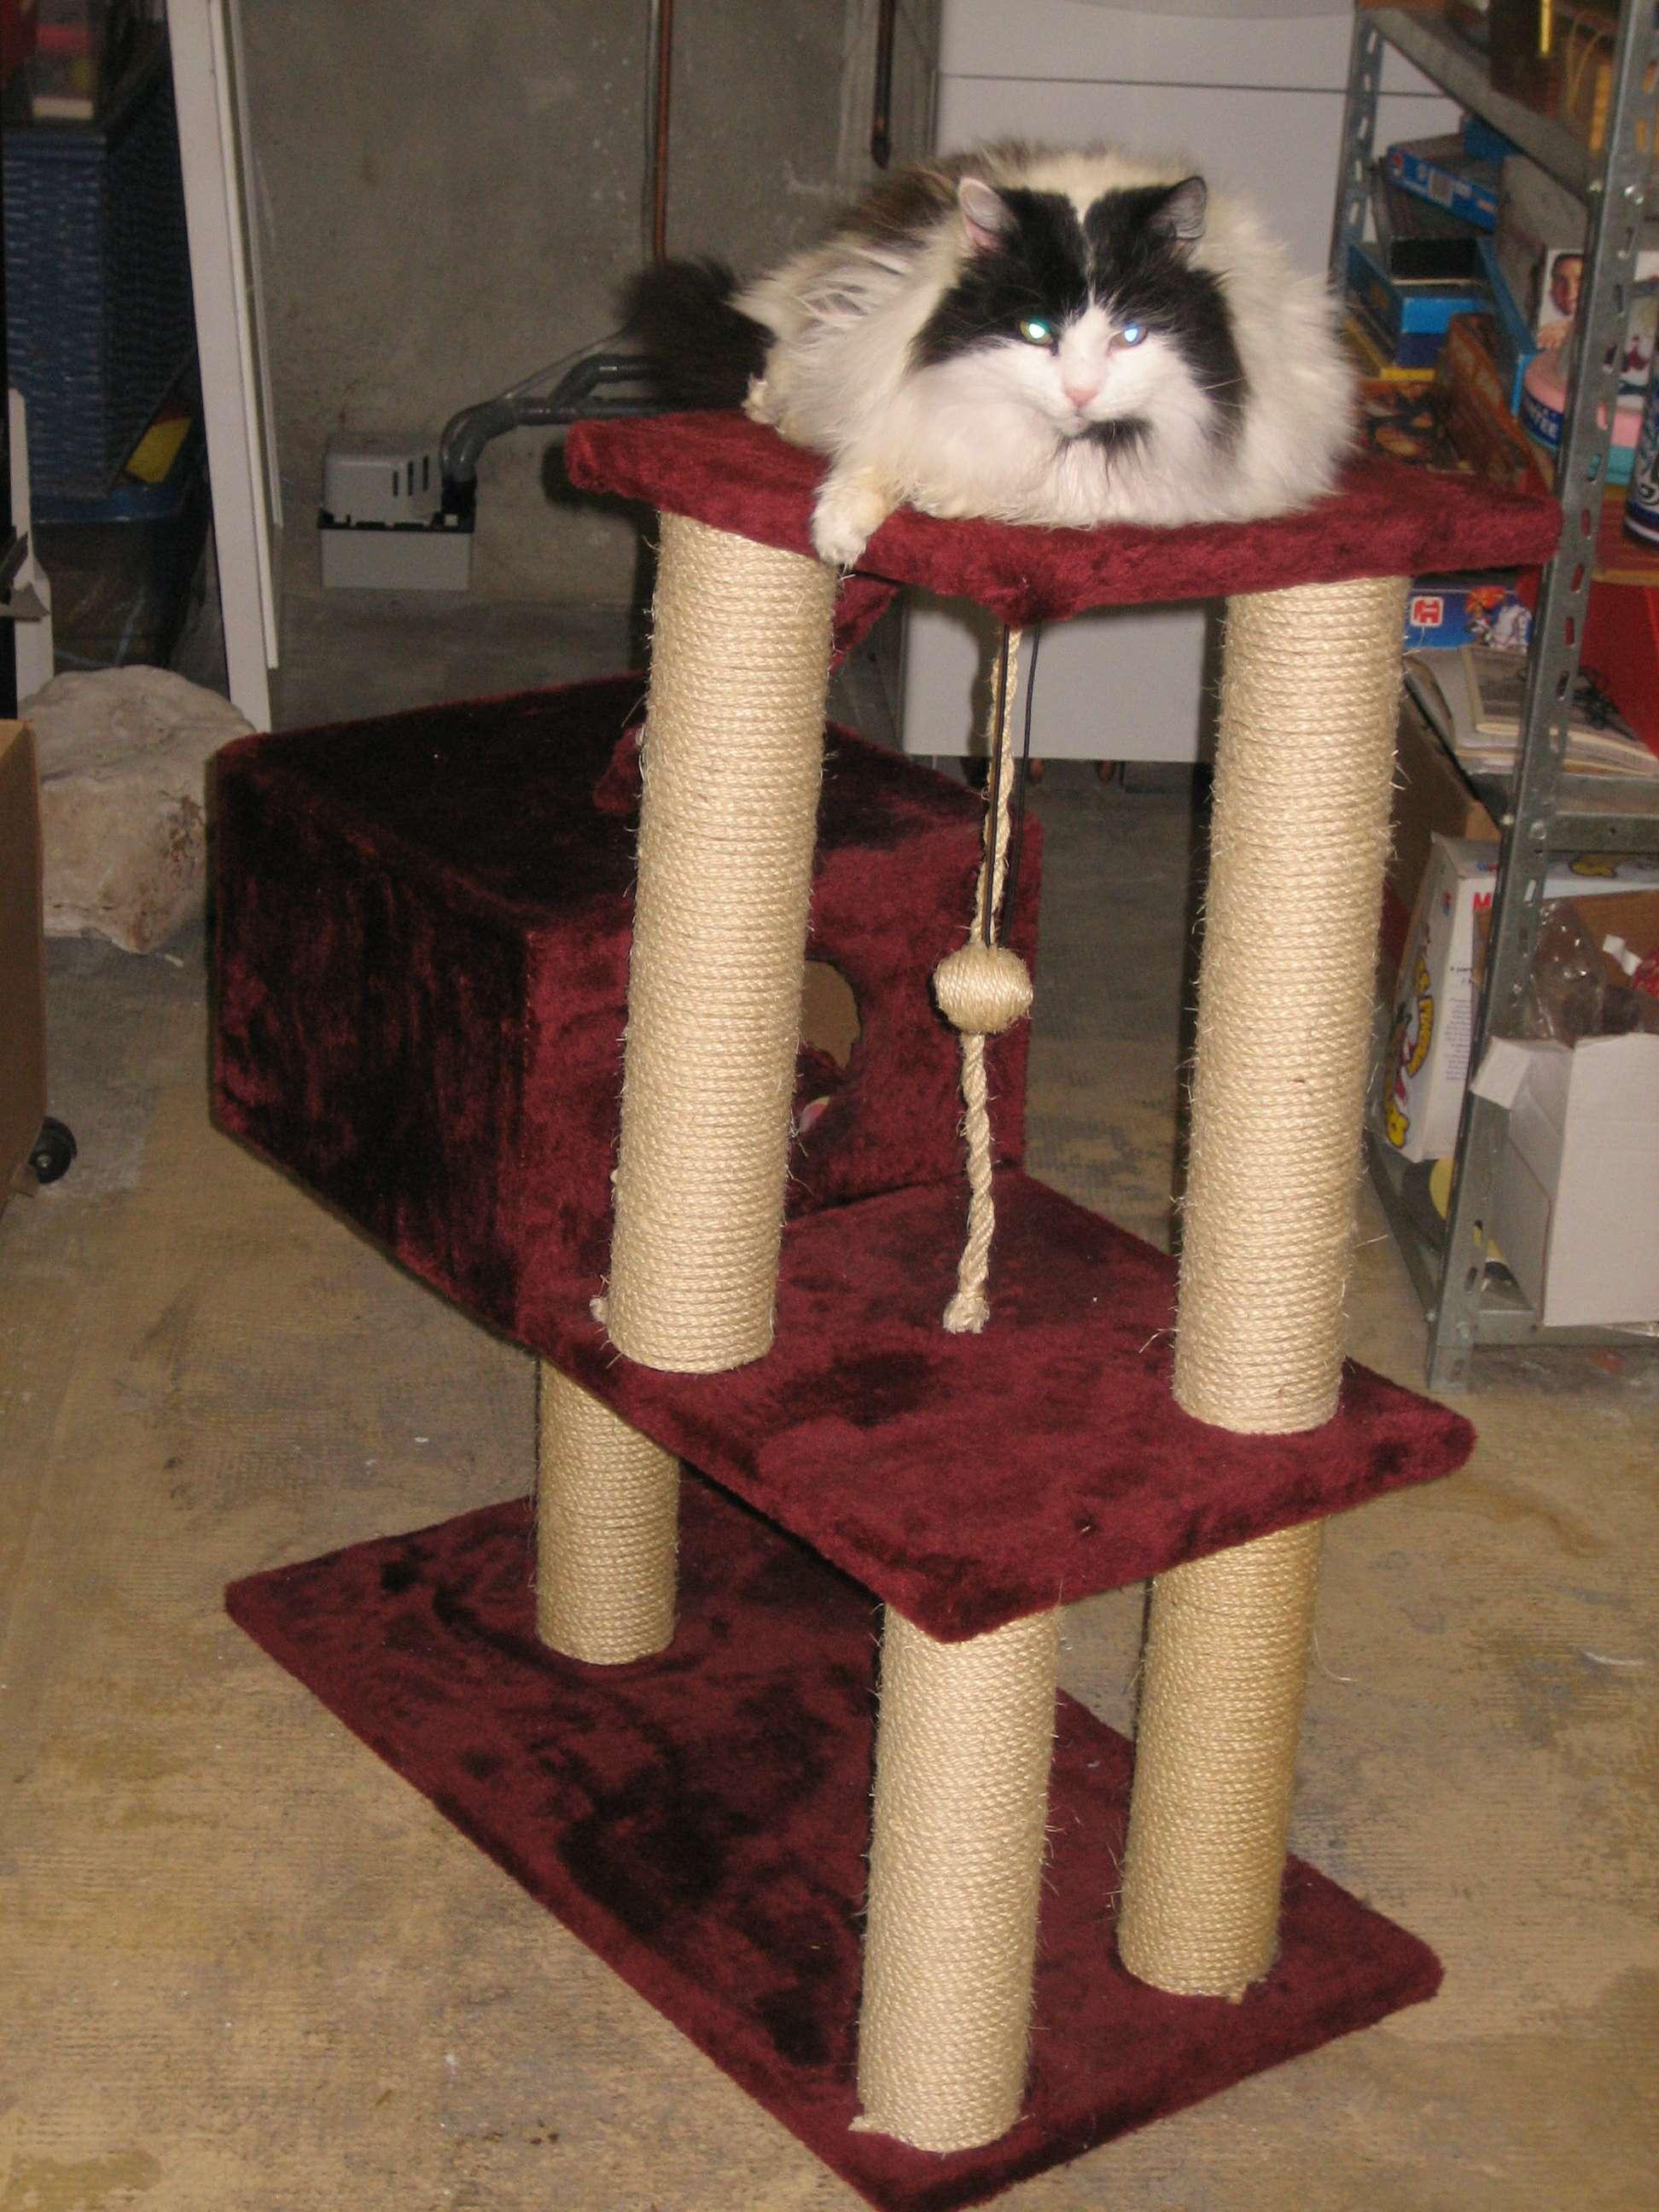 construire maison chat 5690 jpg memes. Black Bedroom Furniture Sets. Home Design Ideas